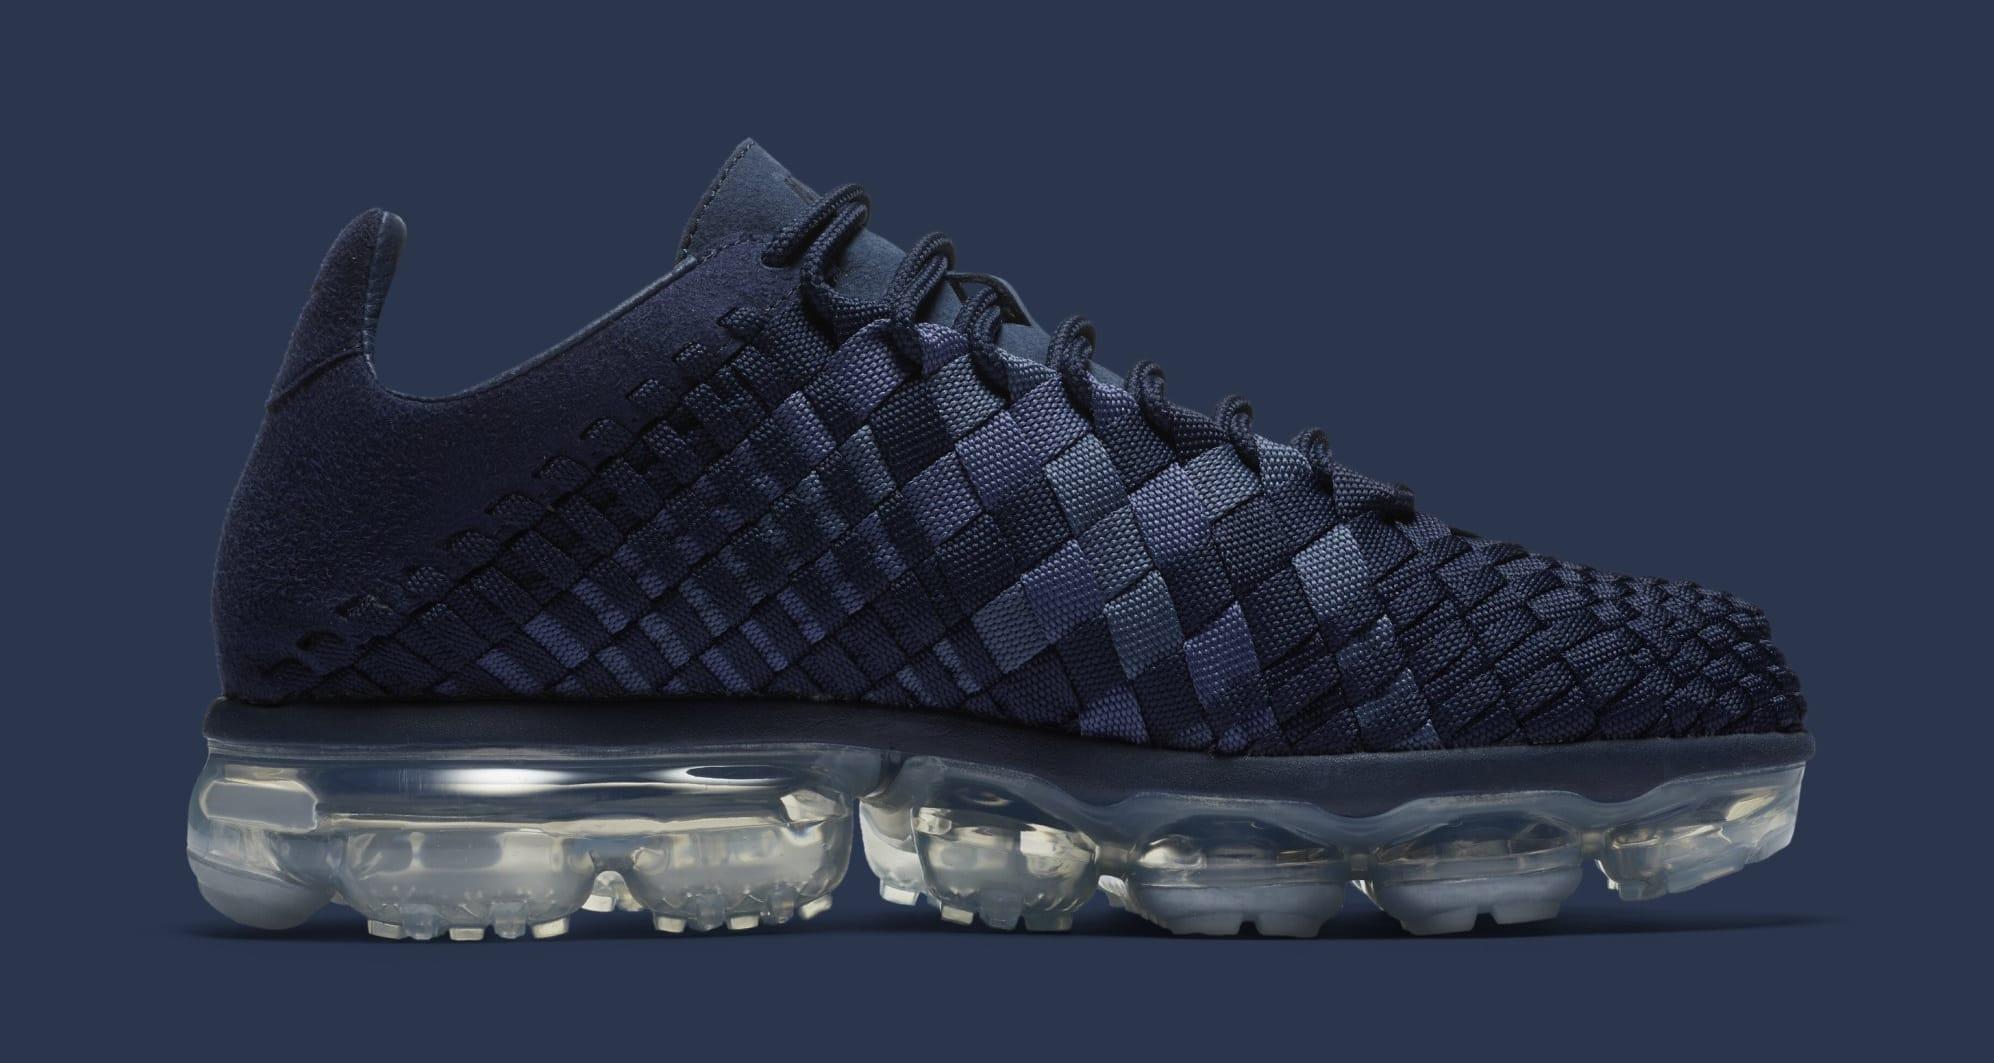 separation shoes 8c63e f9bb5 Nike Air VaporMax Inneva 'Summit White' AO2447-100 'Midnight ...